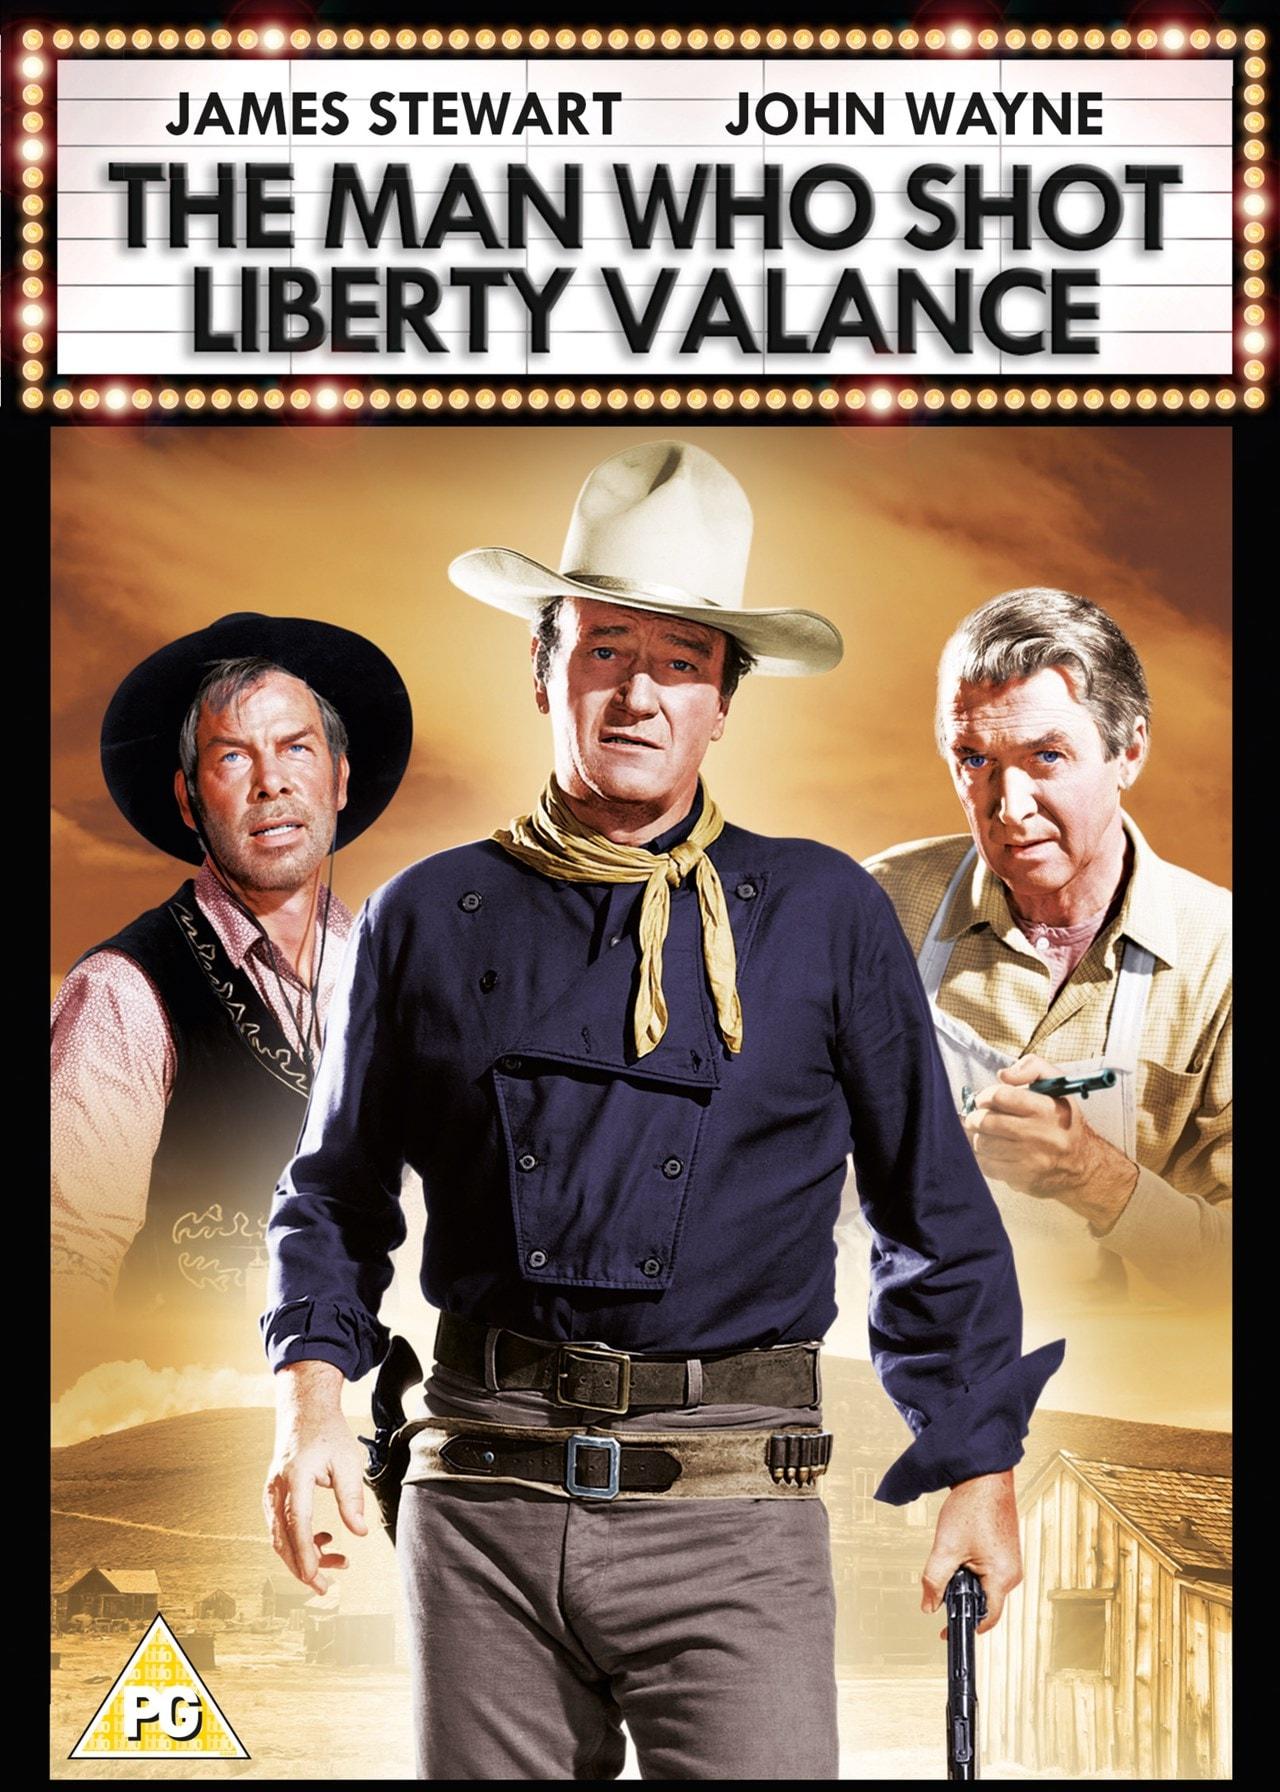 The Man Who Shot Liberty Valance - 1